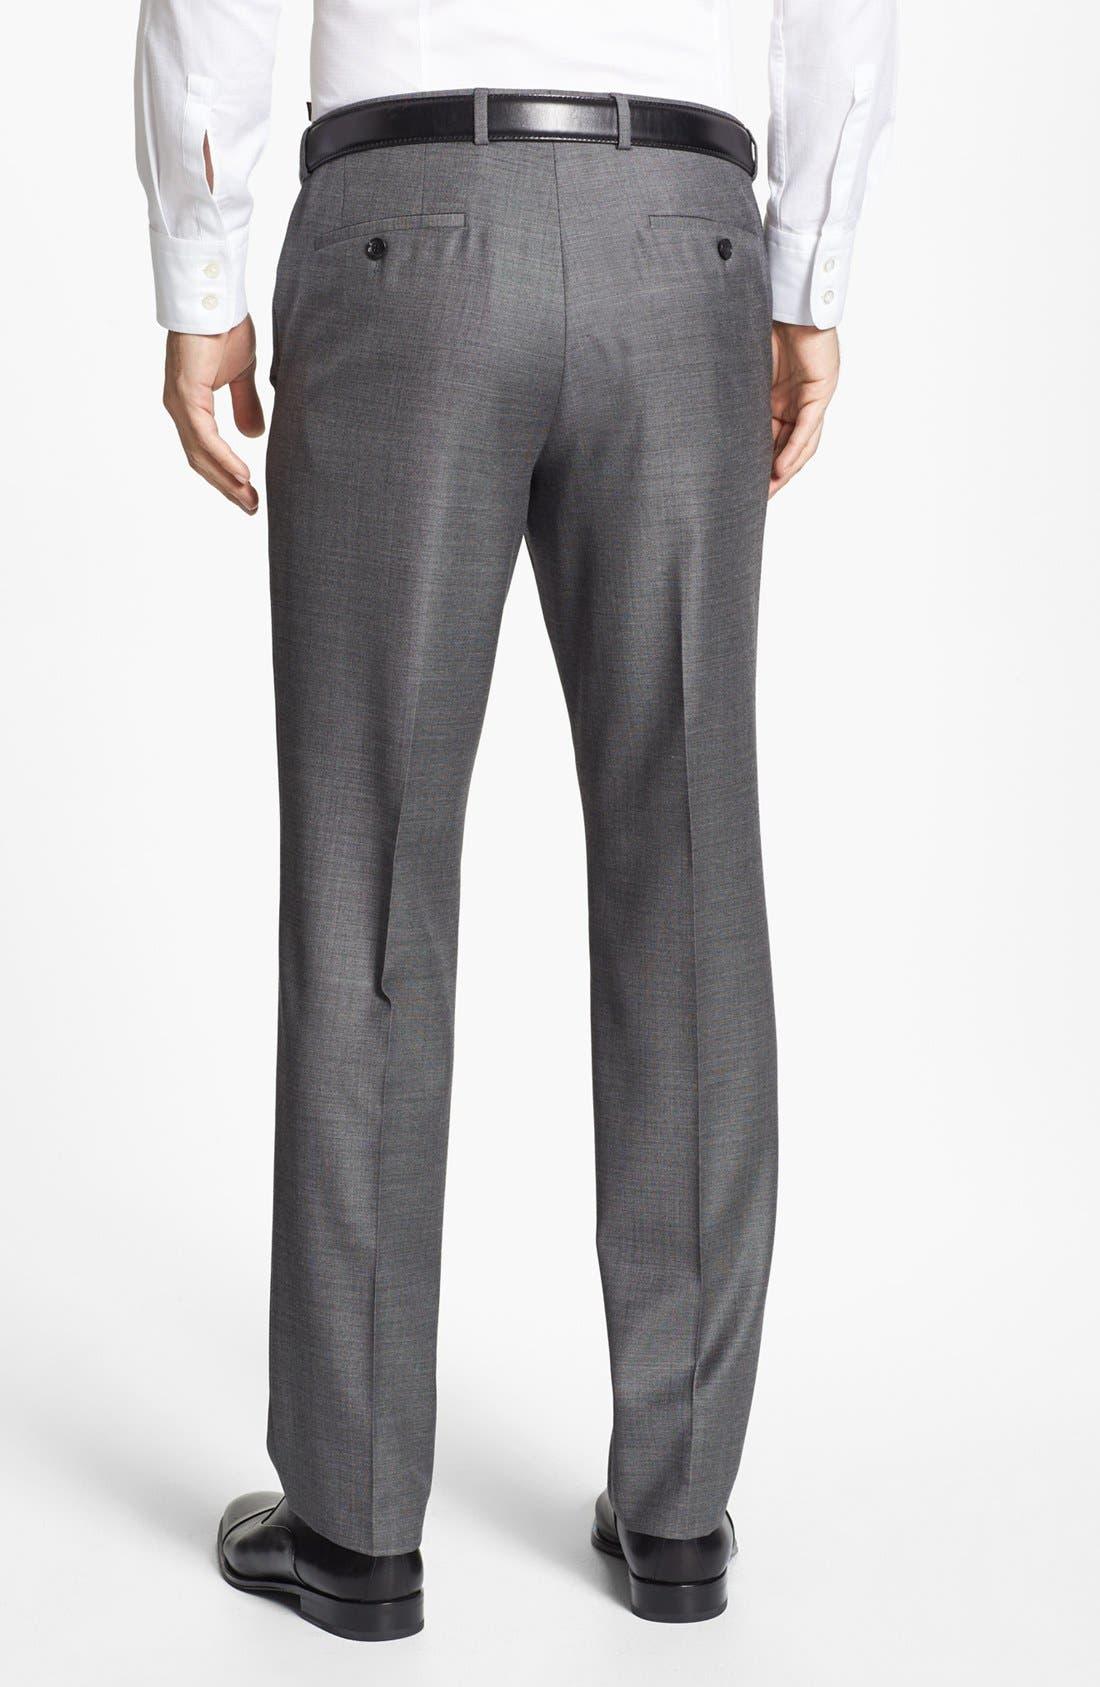 ZZDNUHUGO BOSS,                             BOSS HUGO BOSS 'Sharp' Flat Front Wool Trousers,                             Alternate thumbnail 6, color,                             001